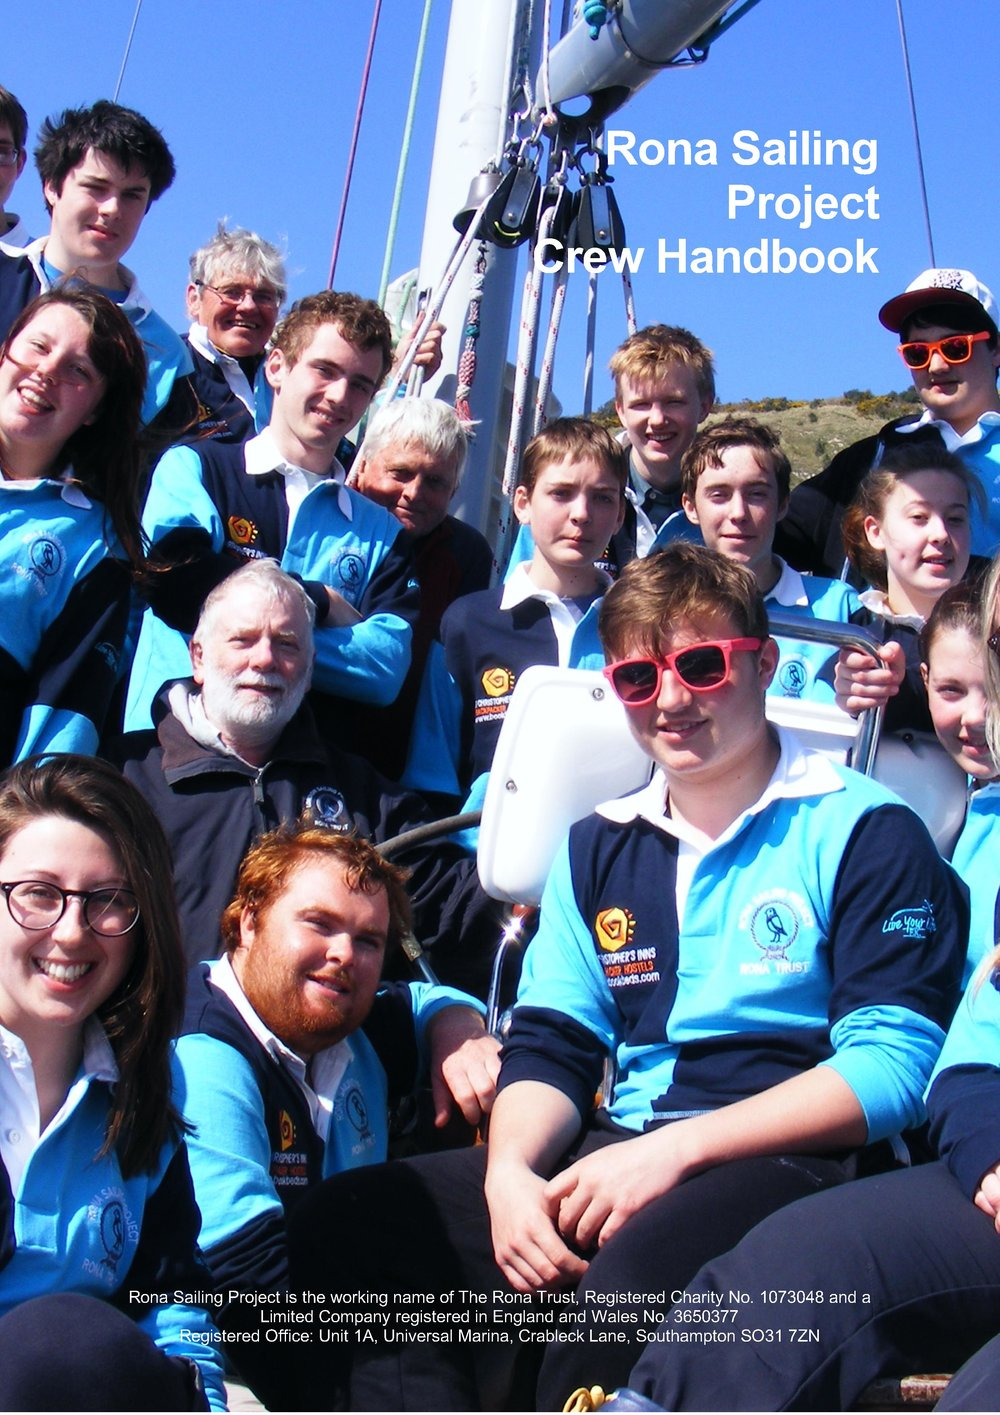 Crew Handbook